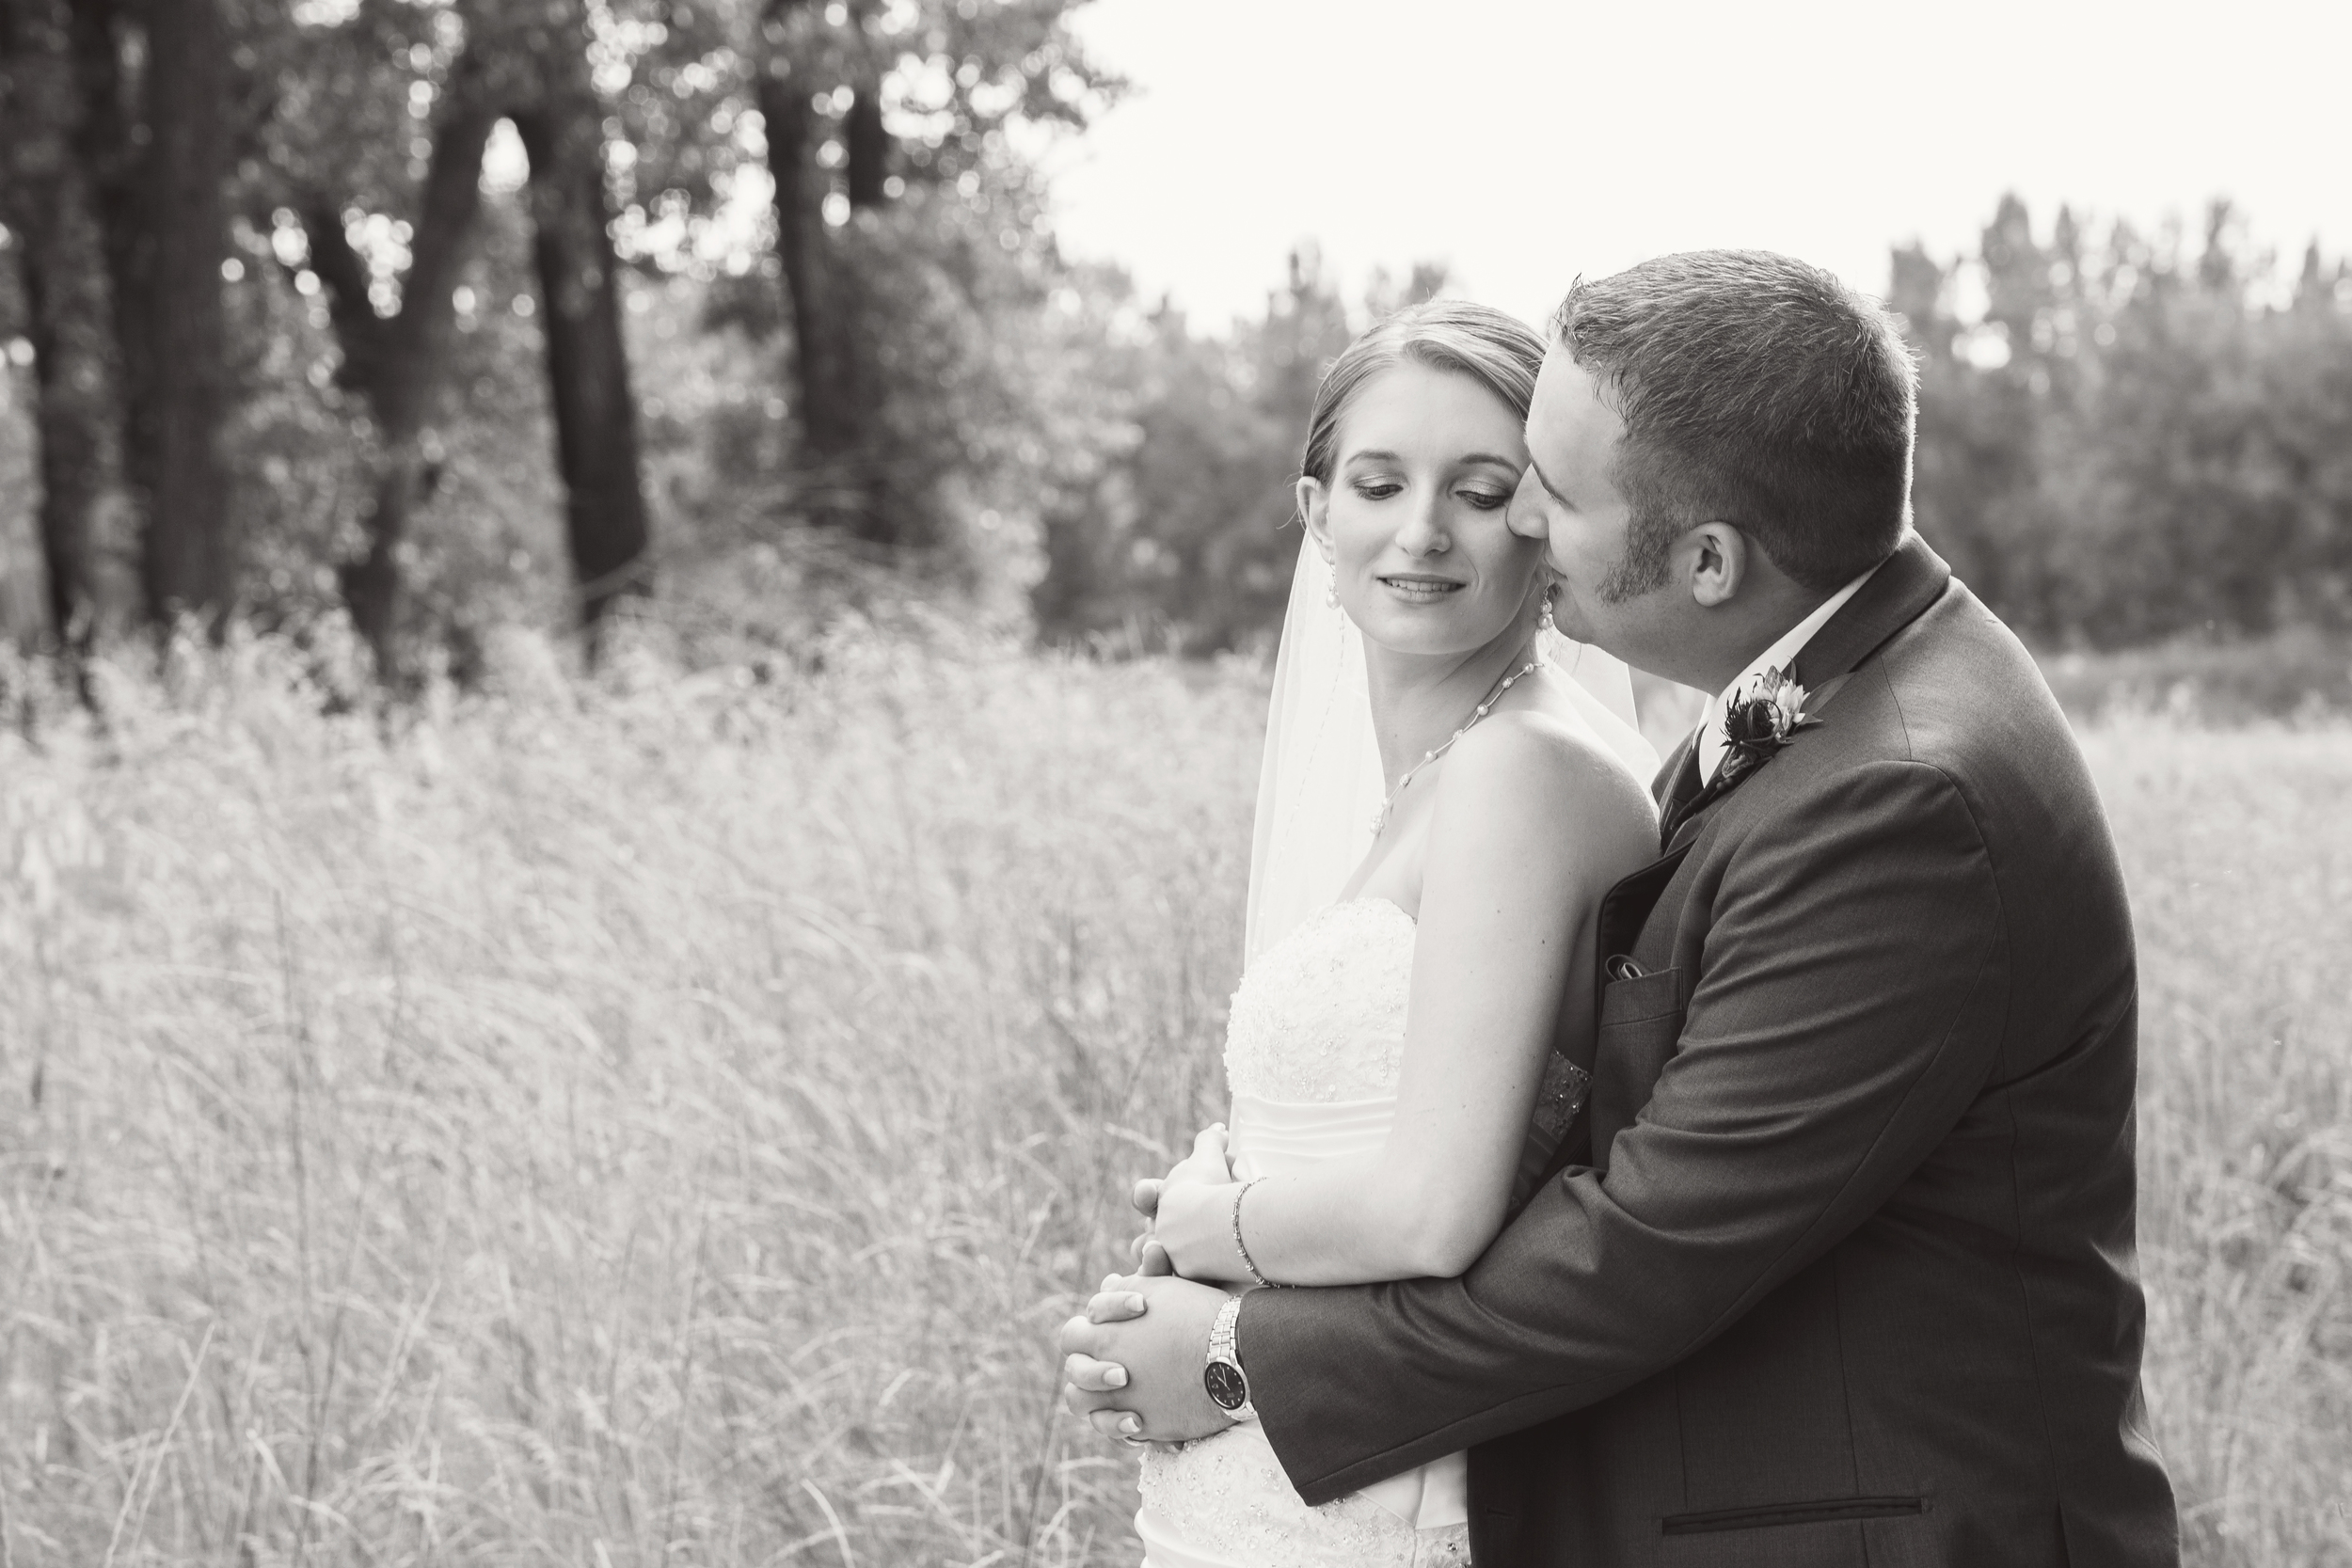 KB_wedding_449_bw.jpg